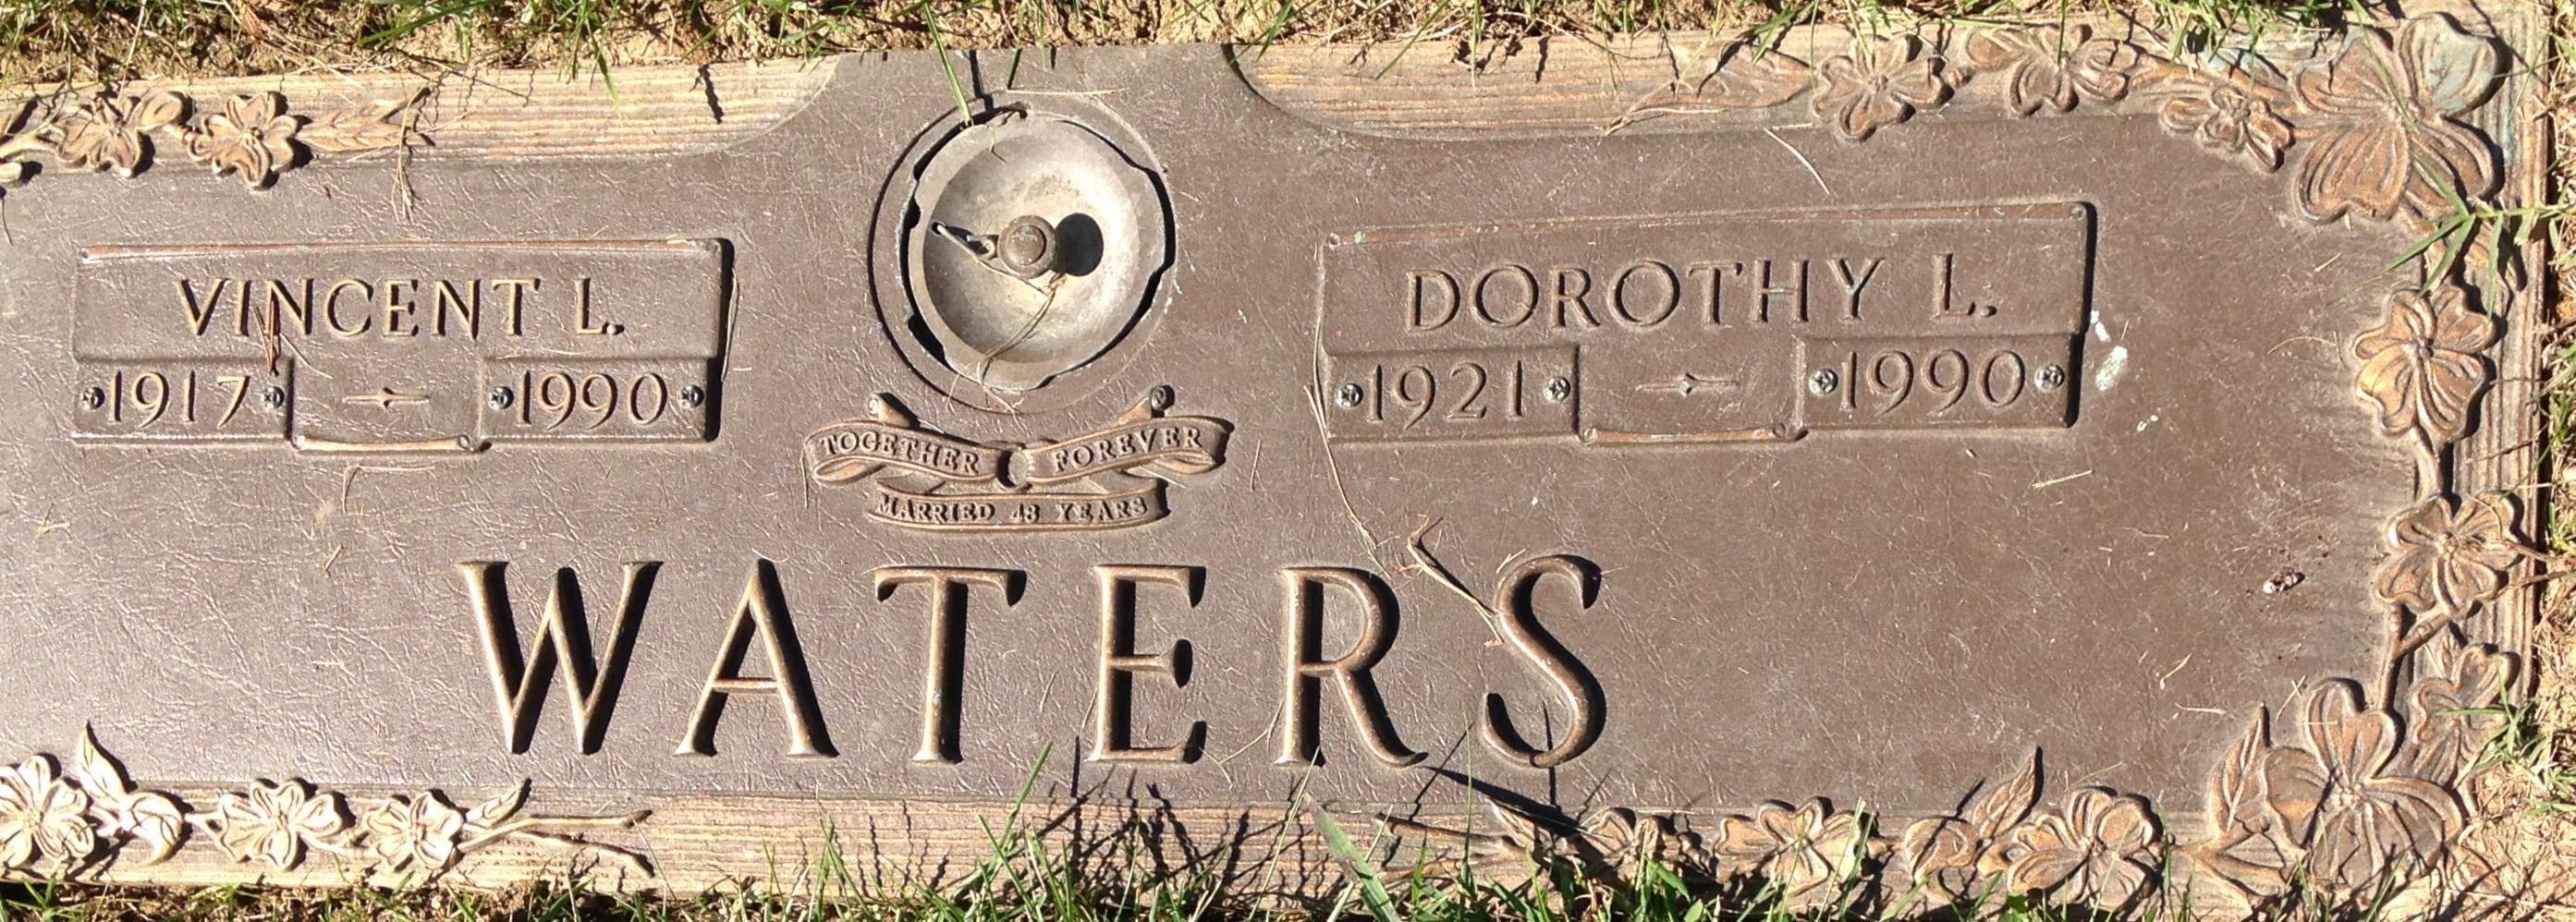 Vincent L Waters (1917-1990) - Find A Grave Memorial